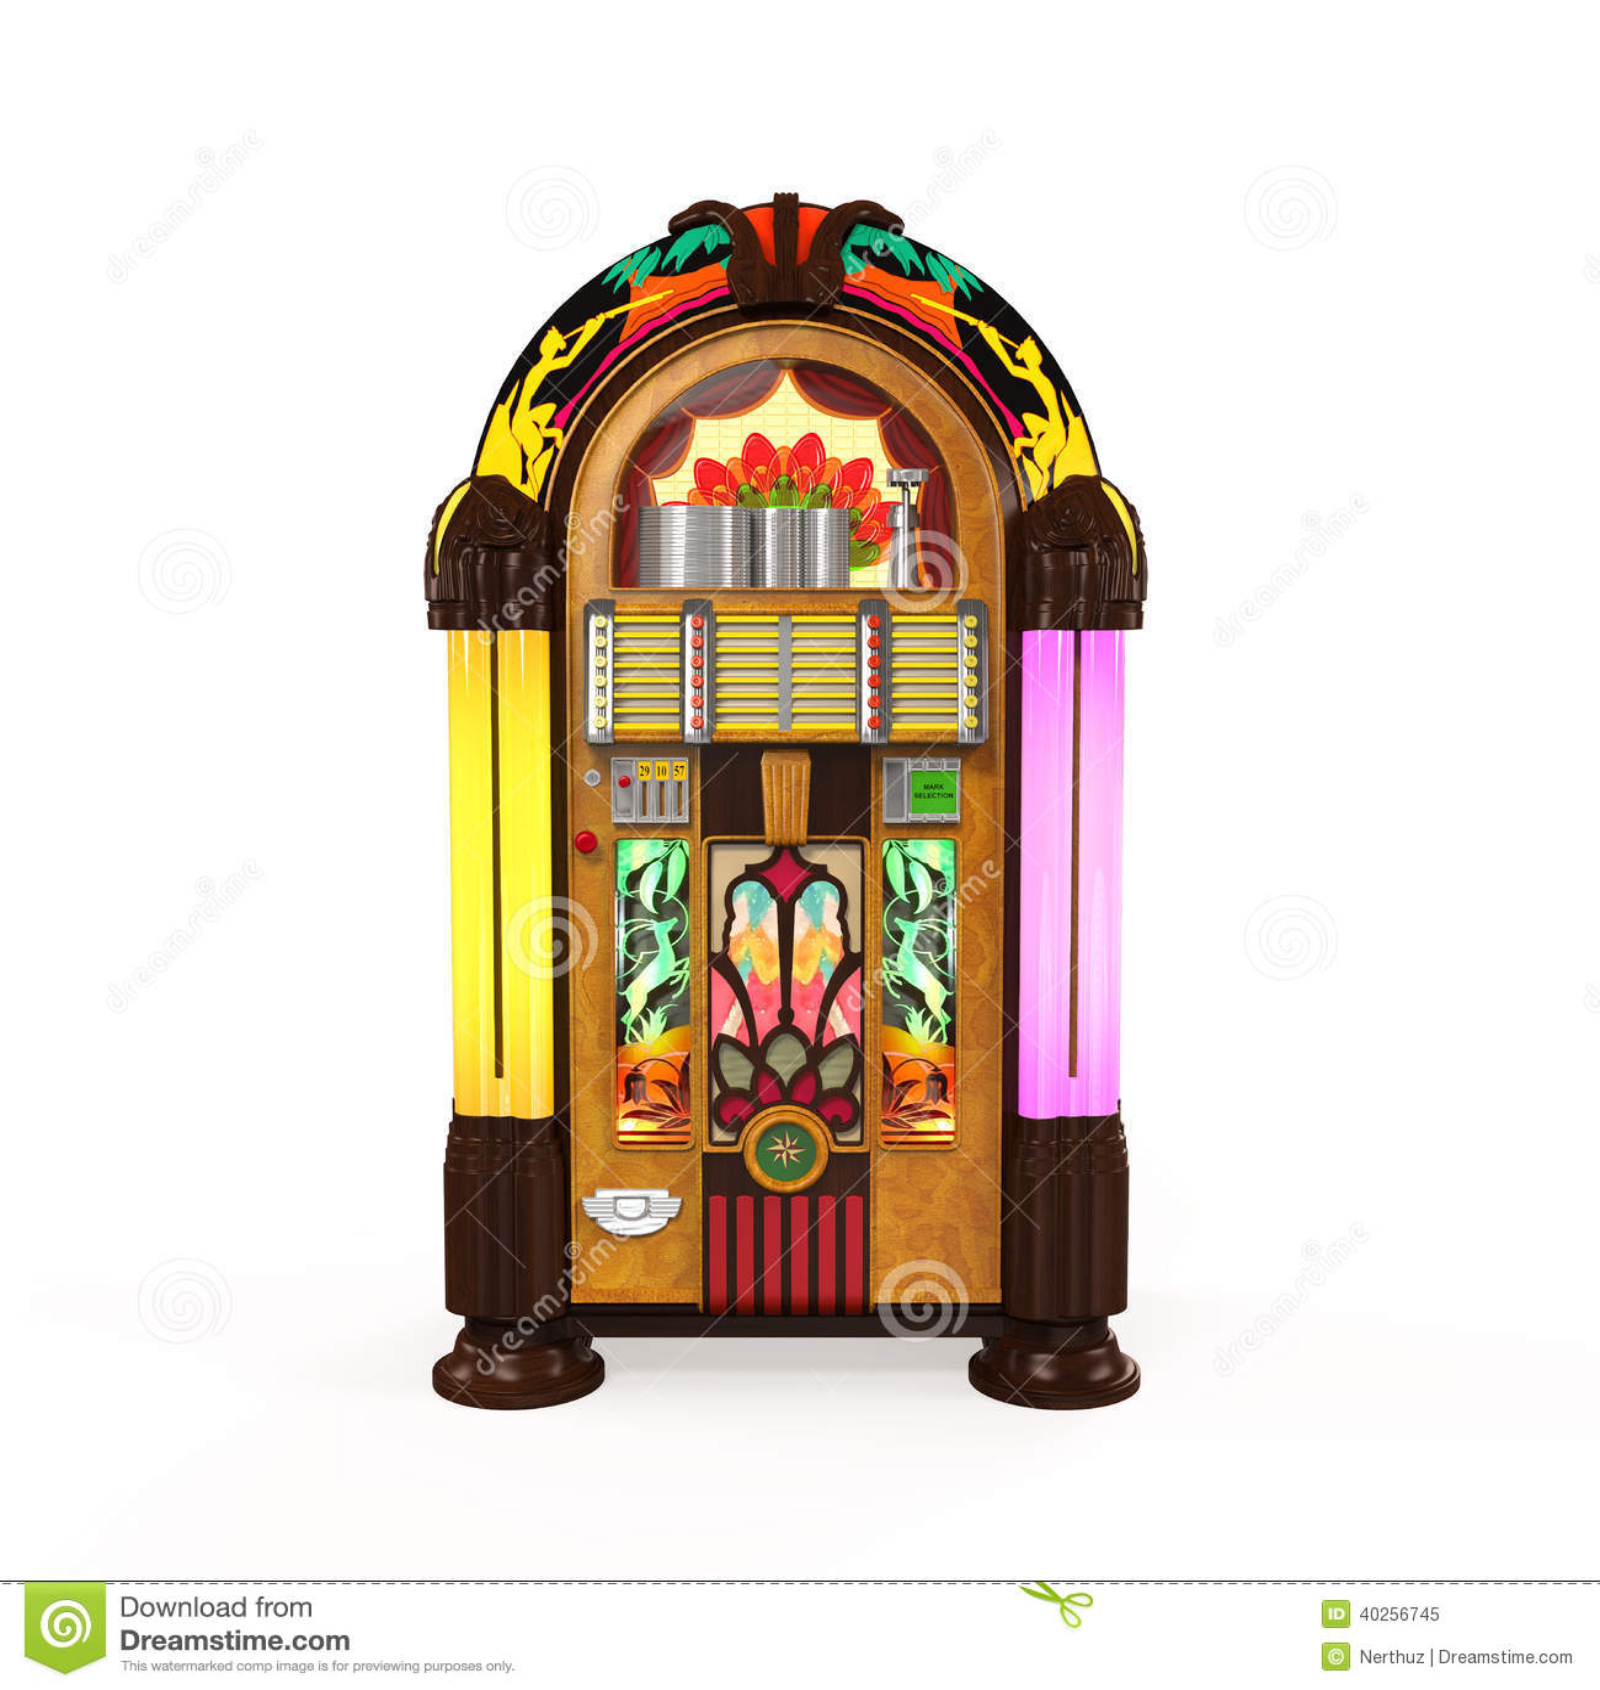 Rádio do jukebox